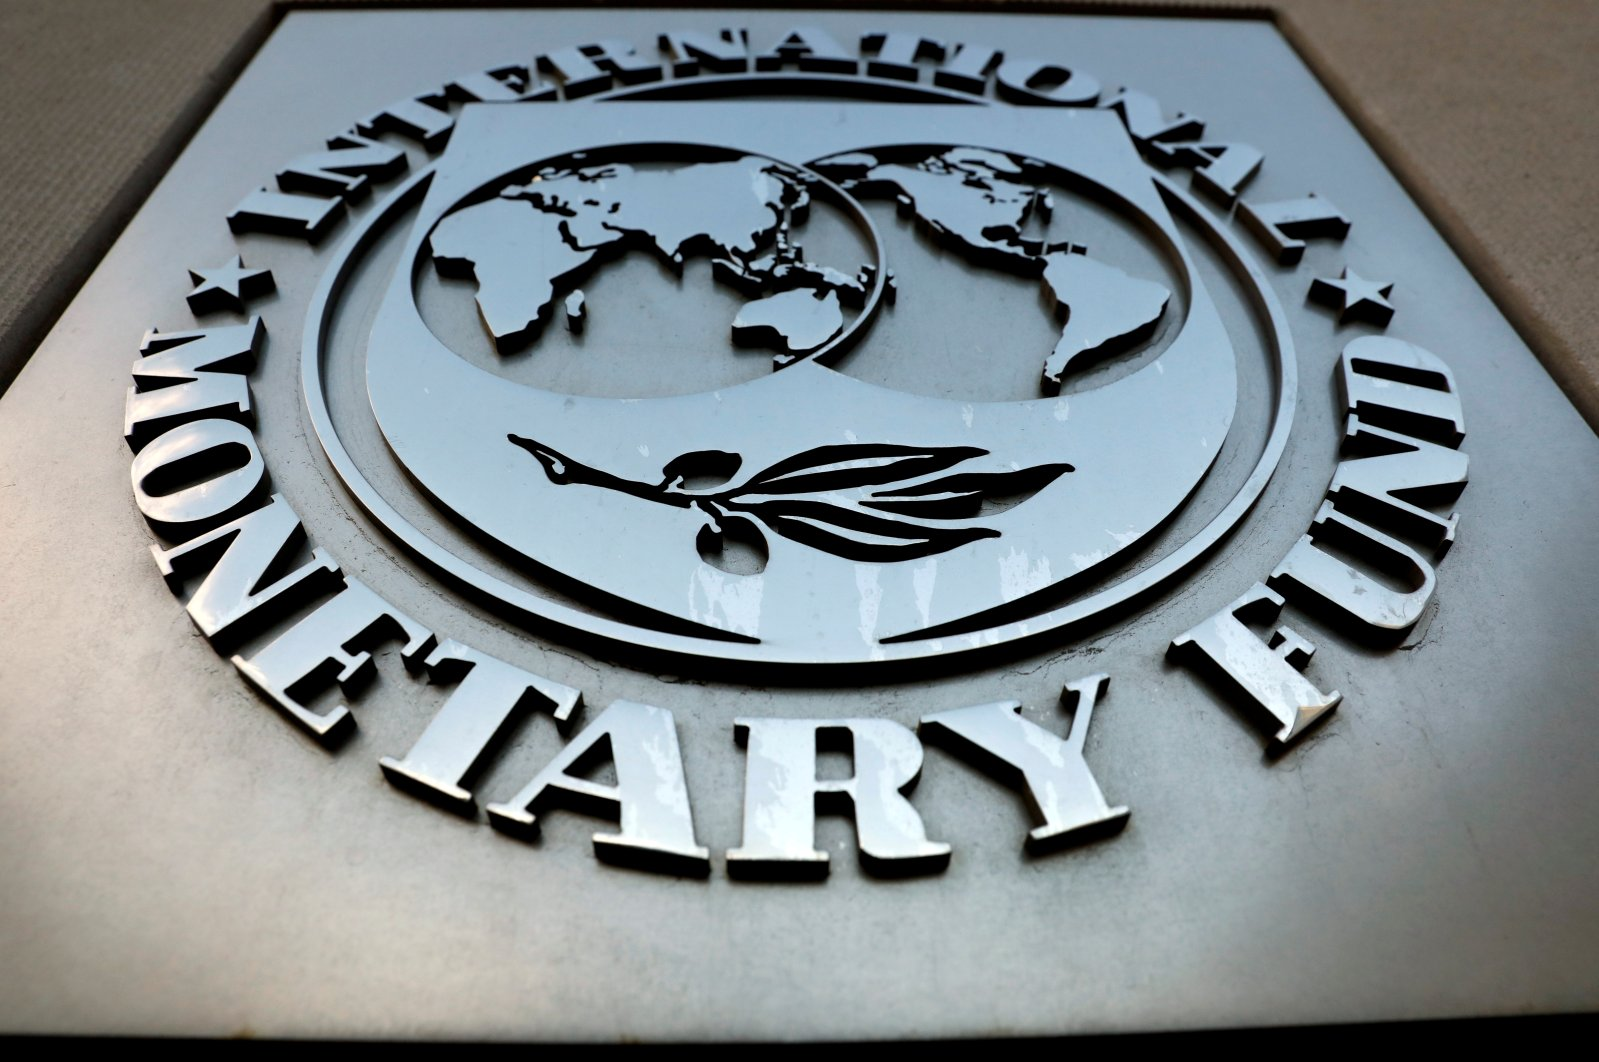 The International Monetary Fund (IMF) logo outside its headquarters in Washington, U.S., Sept. 4, 2018. (Reuters Photo)